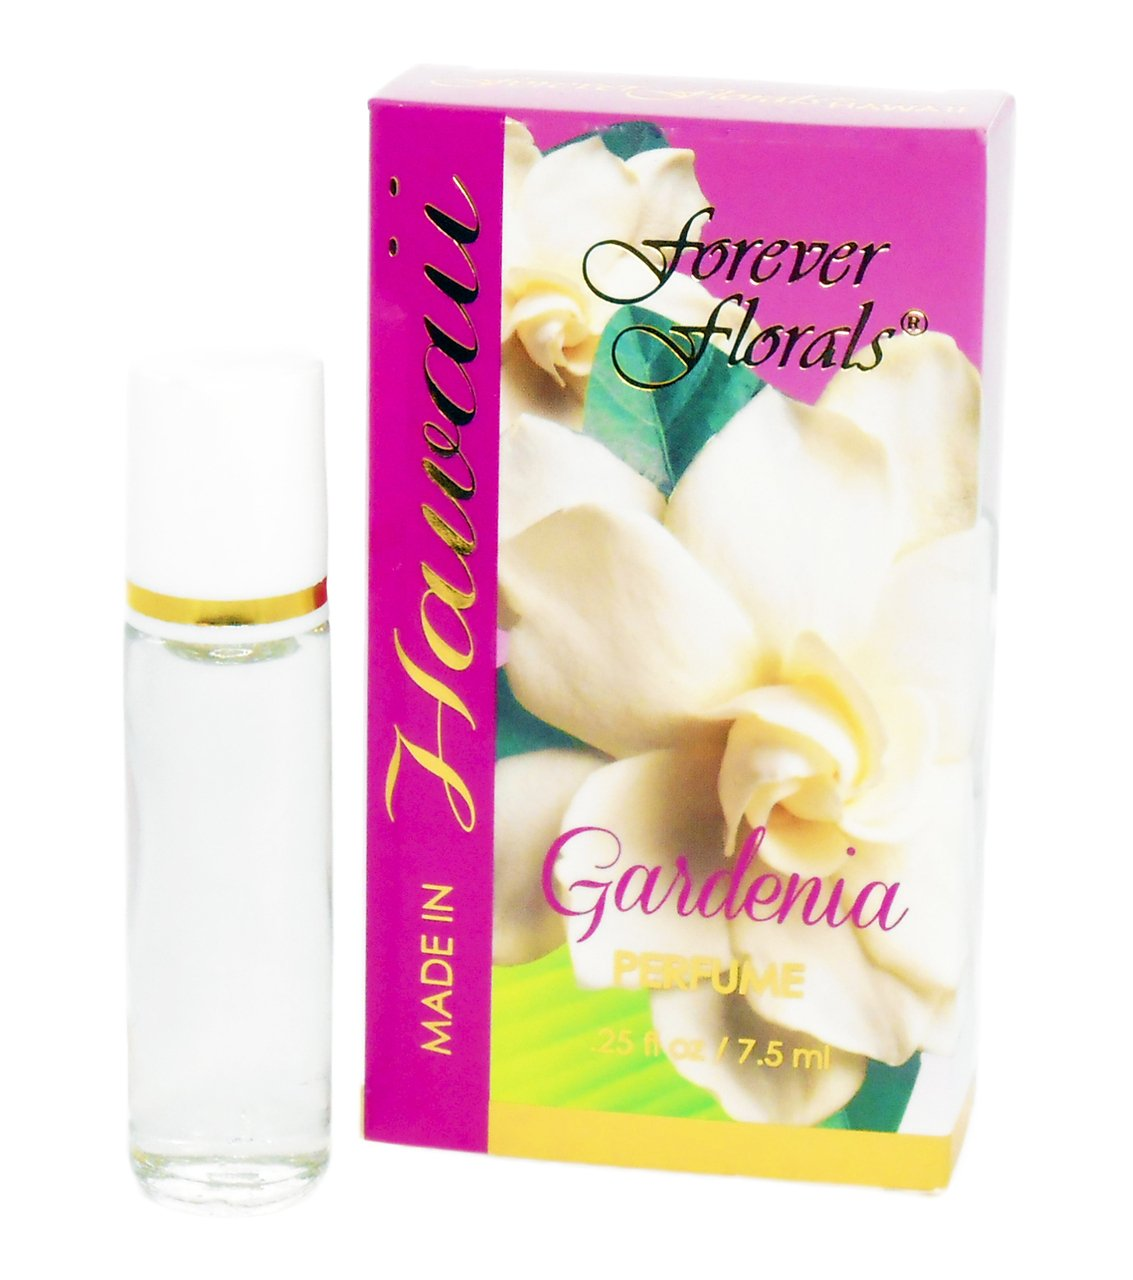 GARDENIA PERFUME - .25 FL OZ - MADE IN HAWAII - BODY CARE